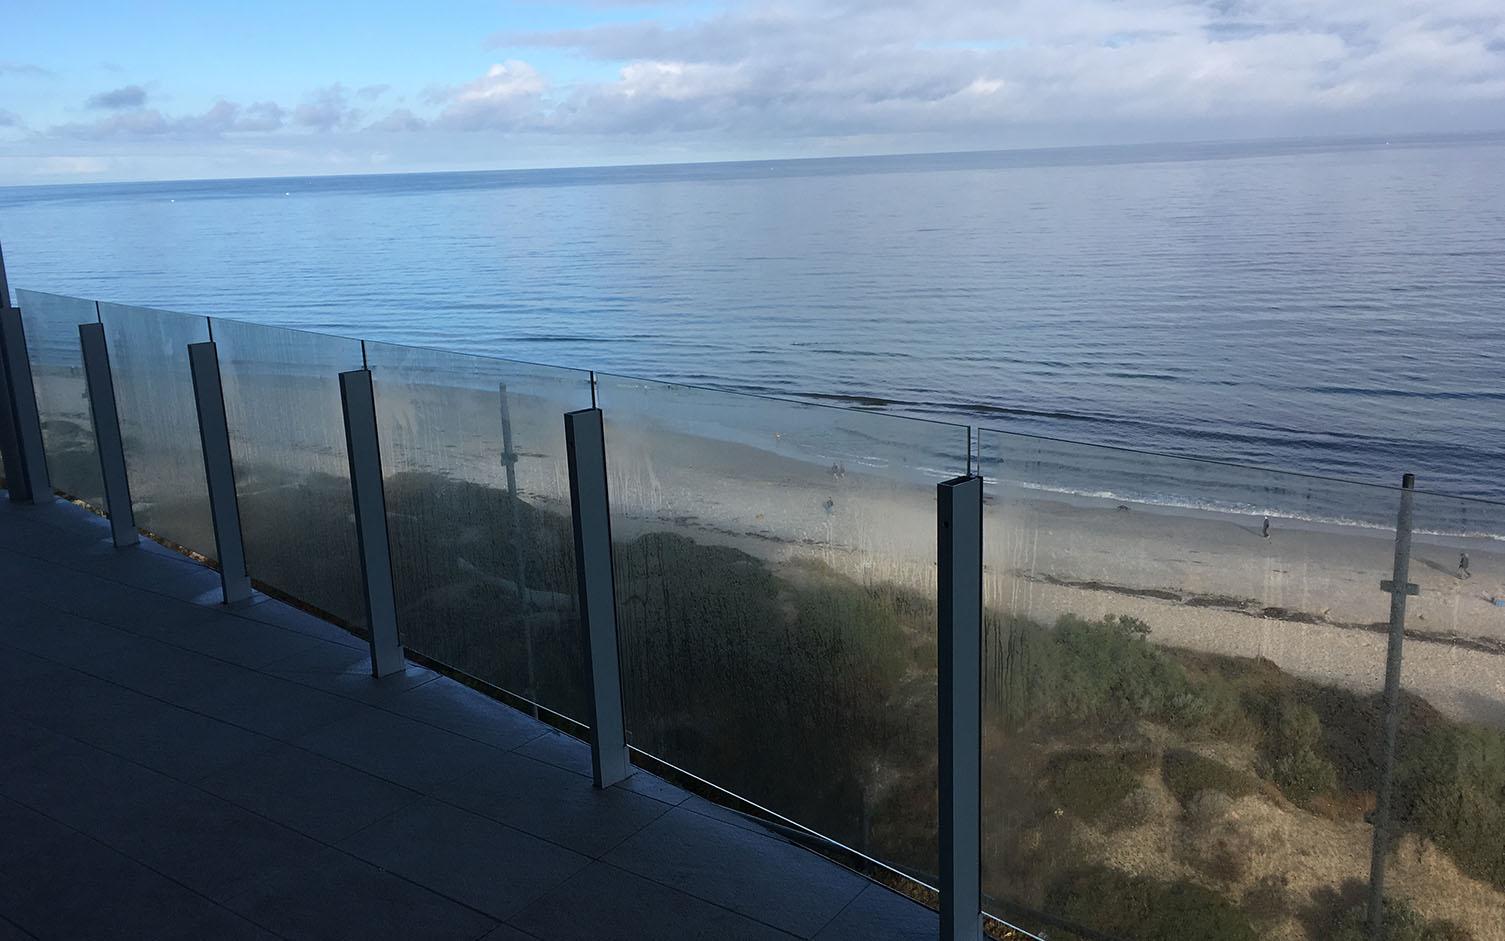 https://ggtiling.com.au/wp-content/uploads/2018/11/G-and-G-Tiling-Minda-Brighton-Dunes_0009_10.jpg